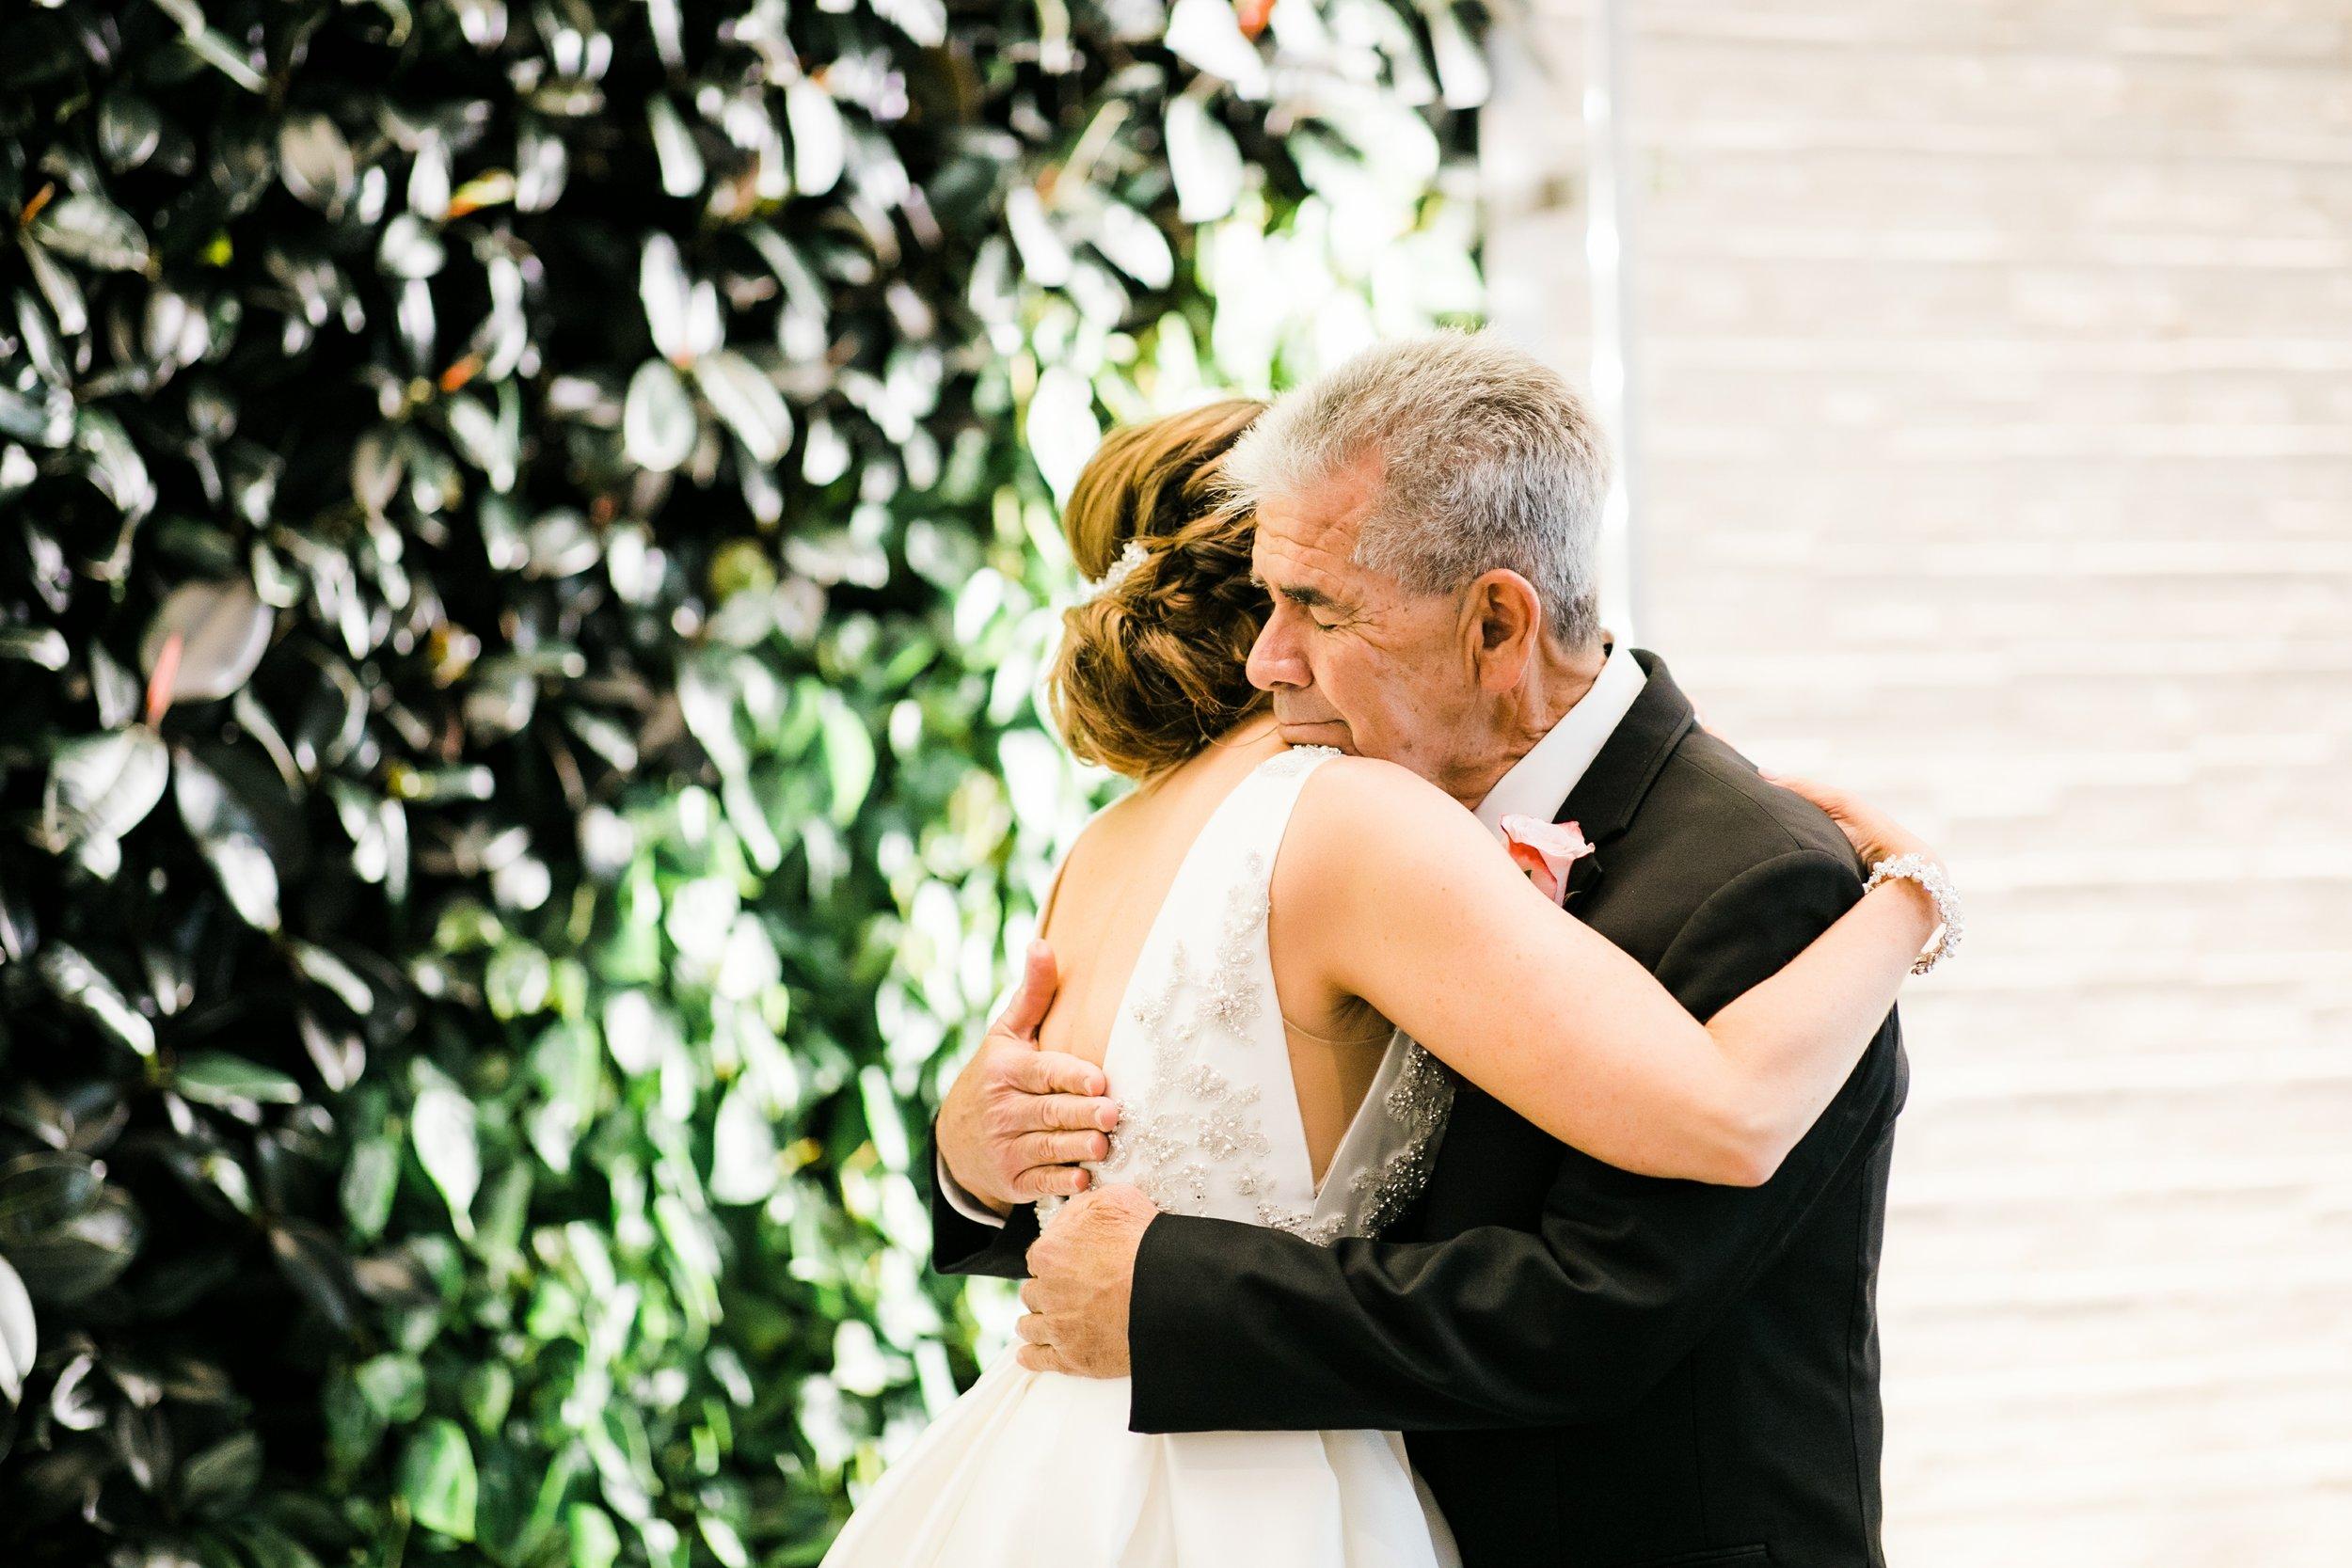 haehn-wedding-little-chapel-in-the-woods-denton-tx-lantana-golf-club-wedding-018.jpg